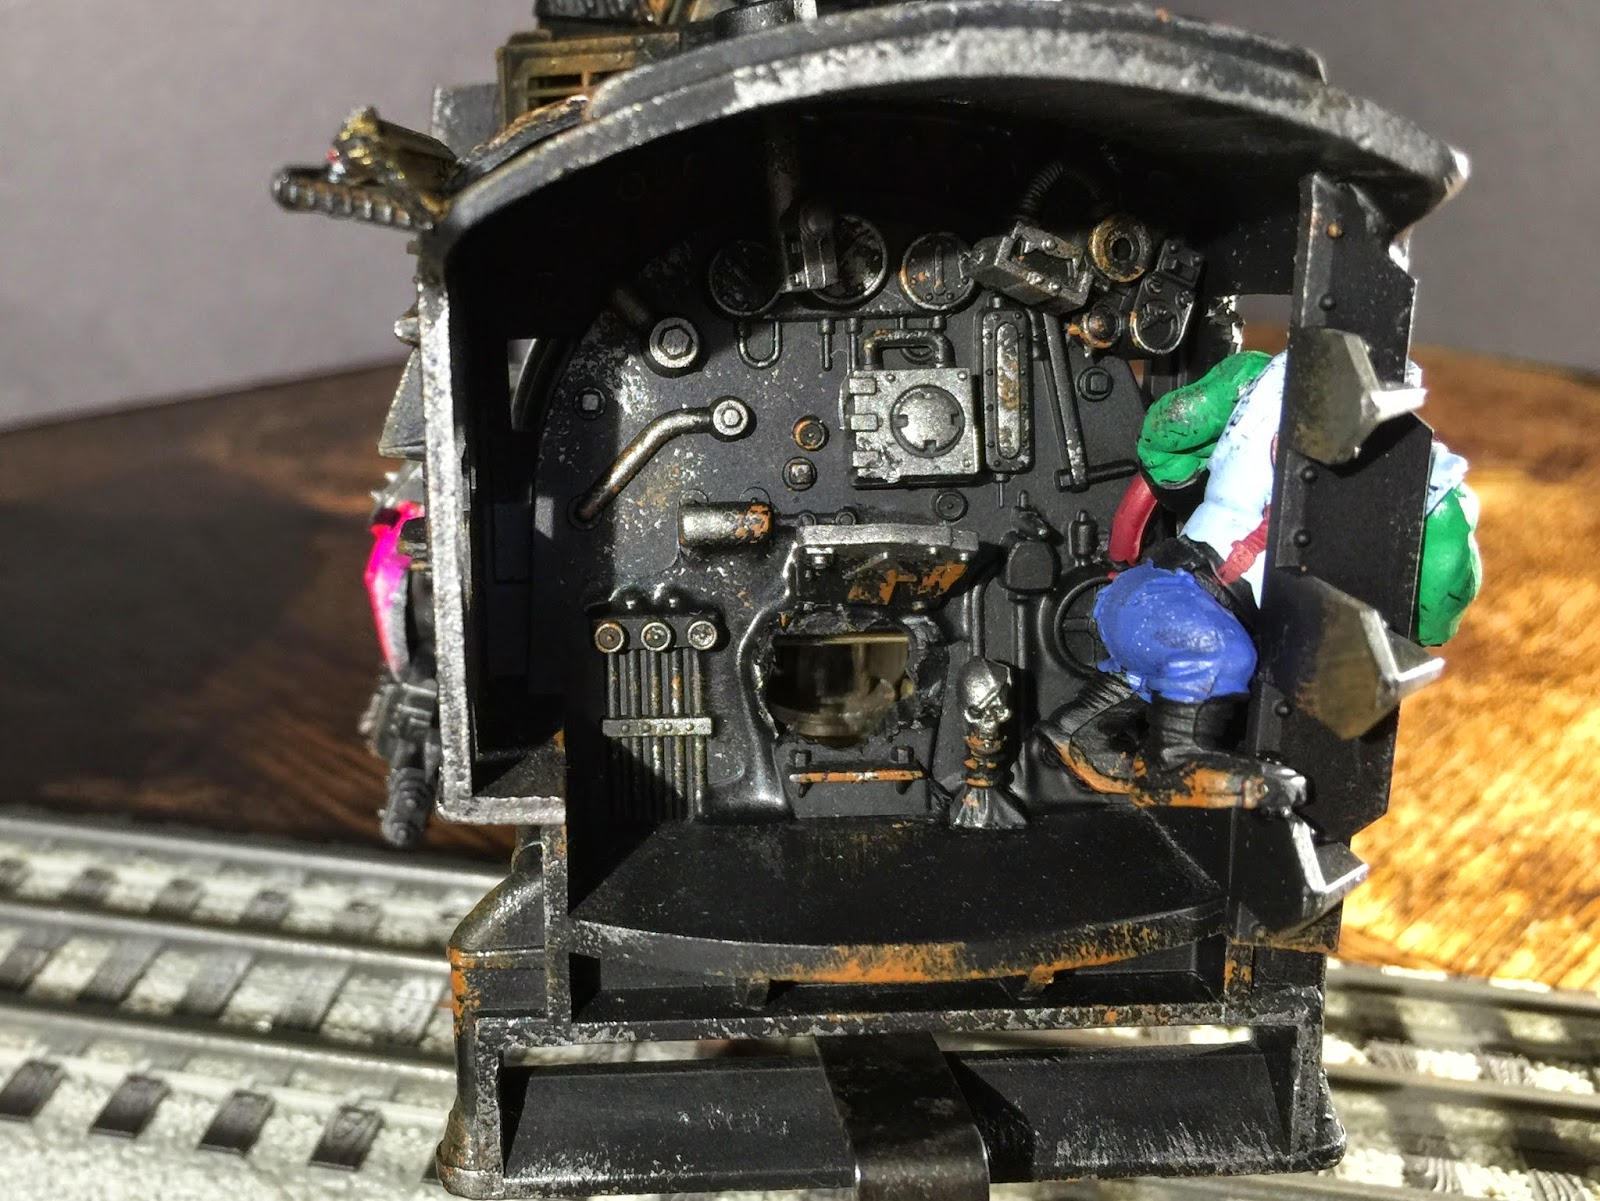 Dakka Chugga Cab; Ork Controls; Ork Boiler; Battle Gaming One